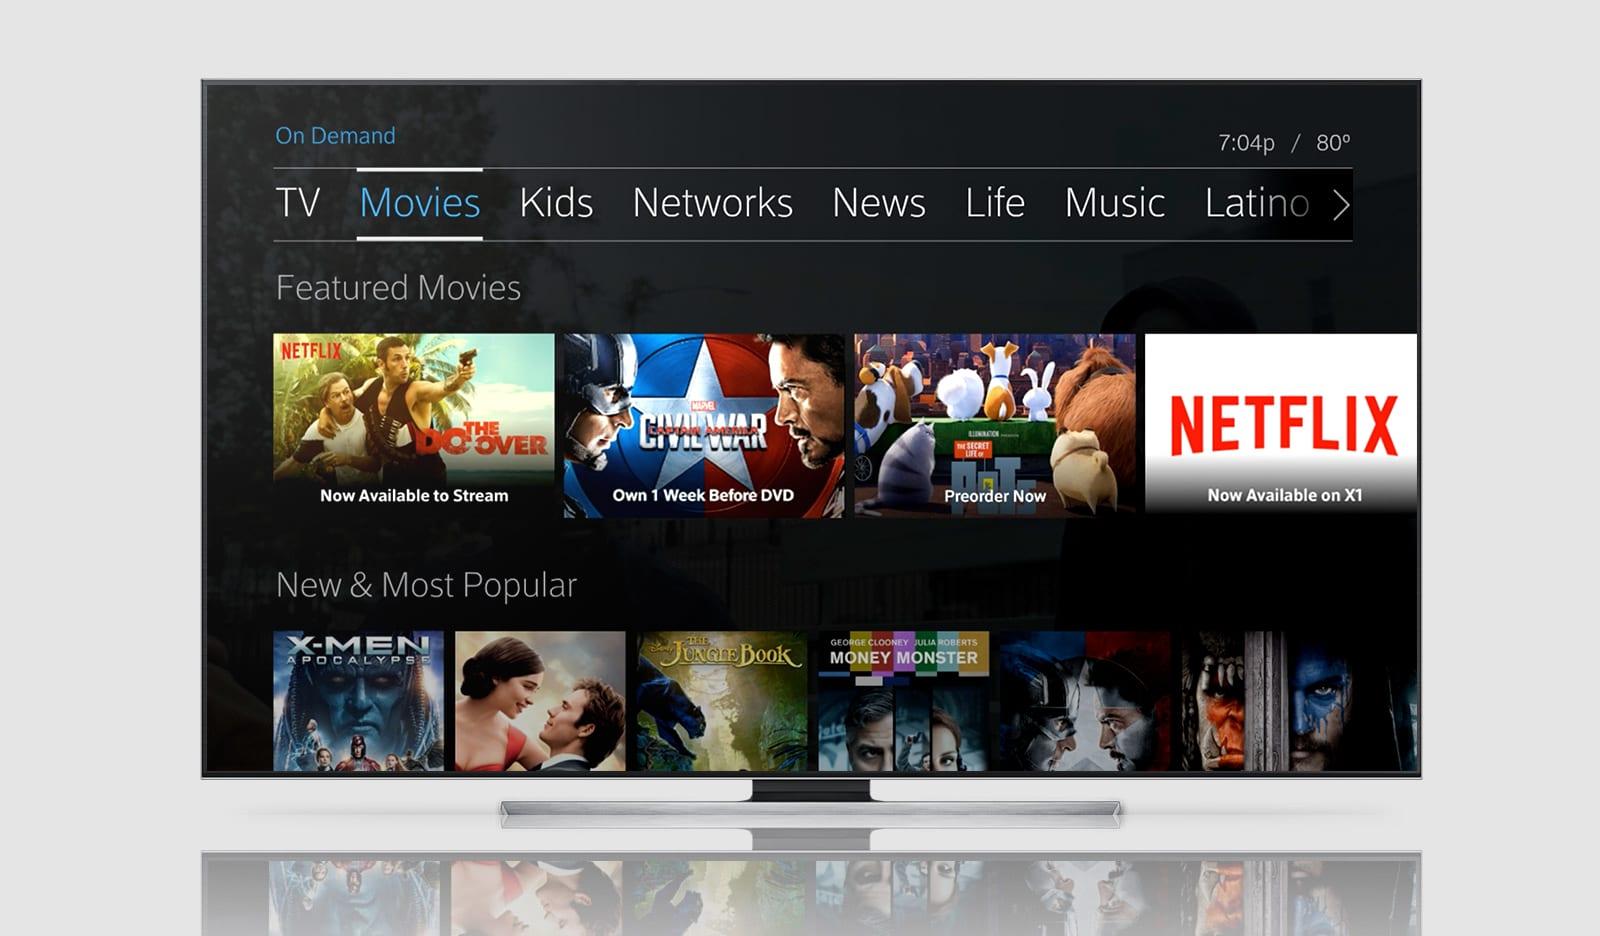 Netflix for Comcast Customers